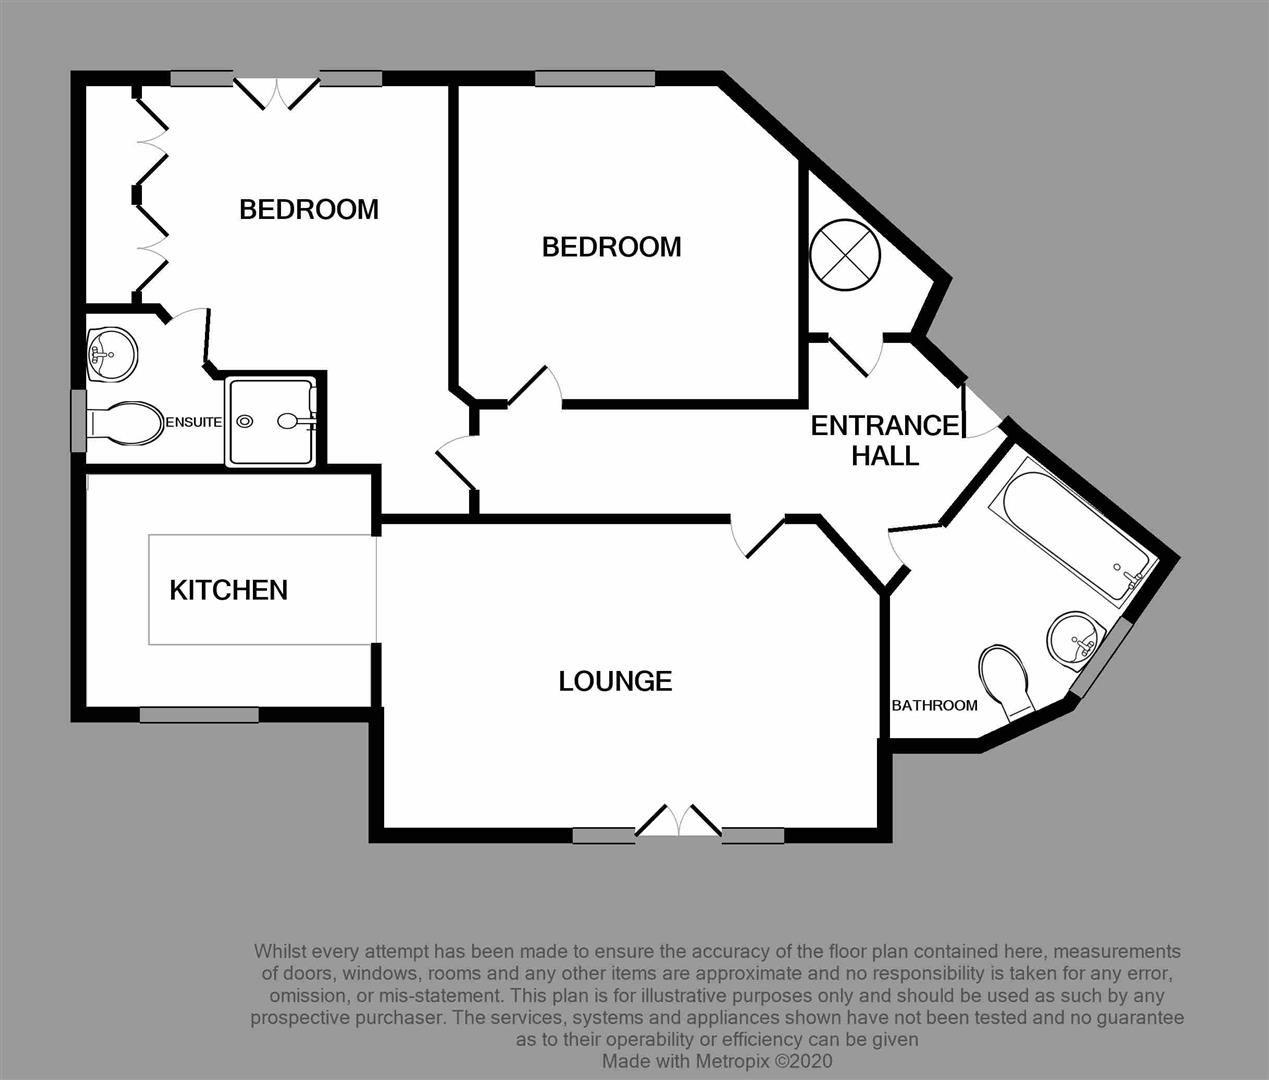 2 bed flat for sale - Property Floorplan